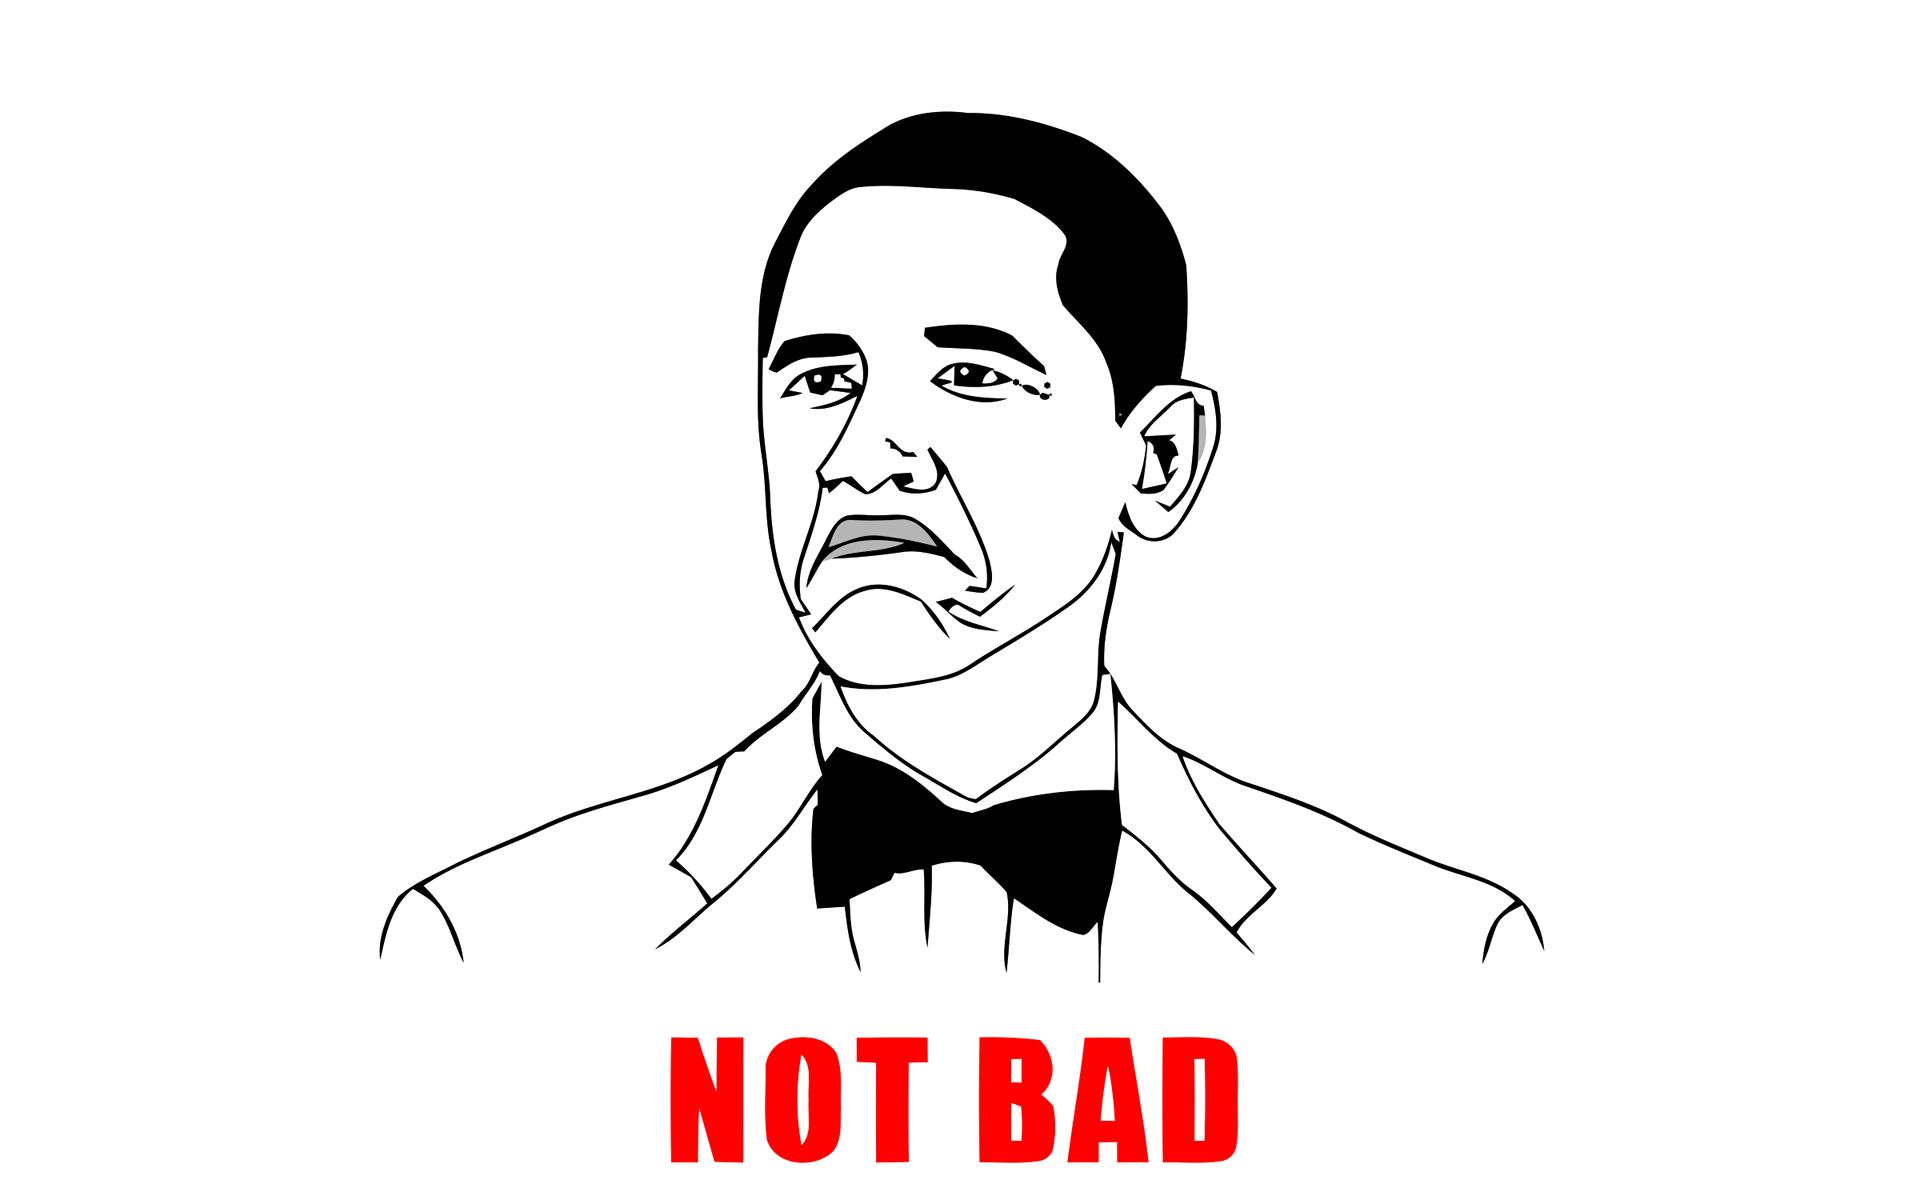 Obama 'Not Bad' meme